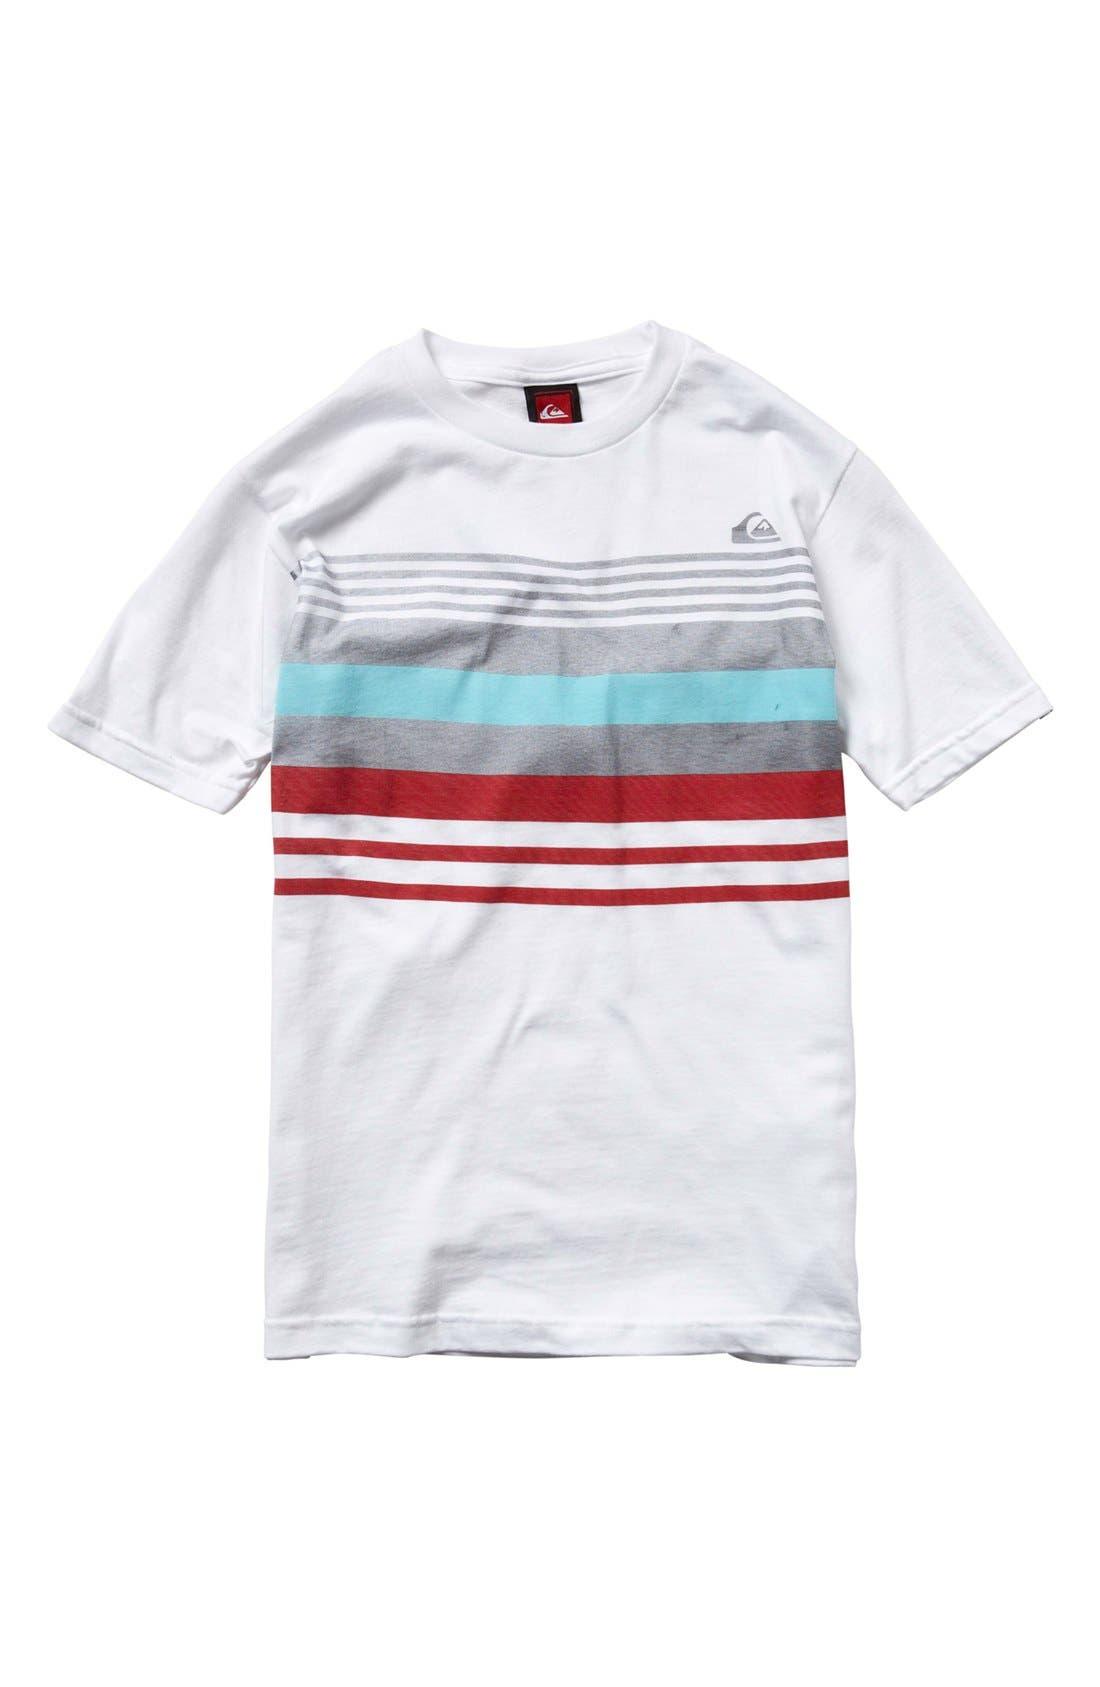 Main Image - Quiksilver 'OC Coastal' T-Shirt (Little Boys)